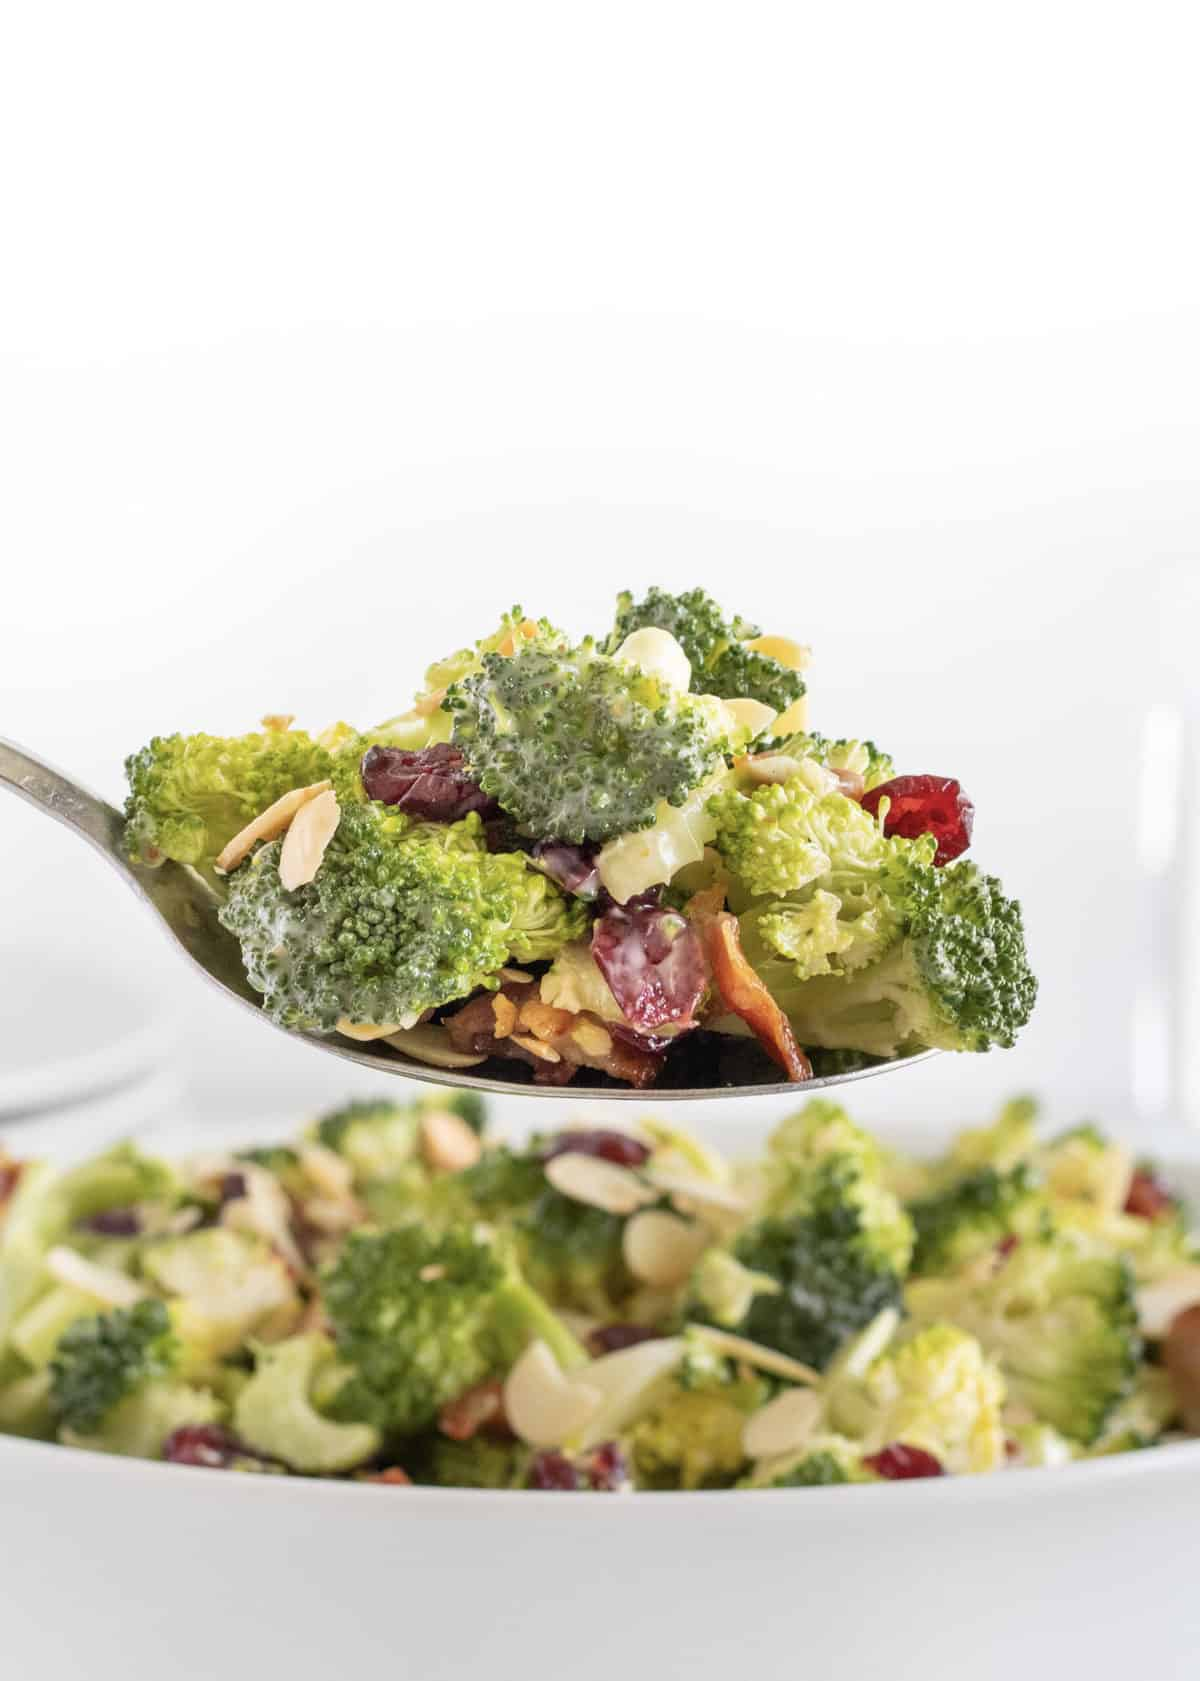 Broccoli Salad by The BakerMama